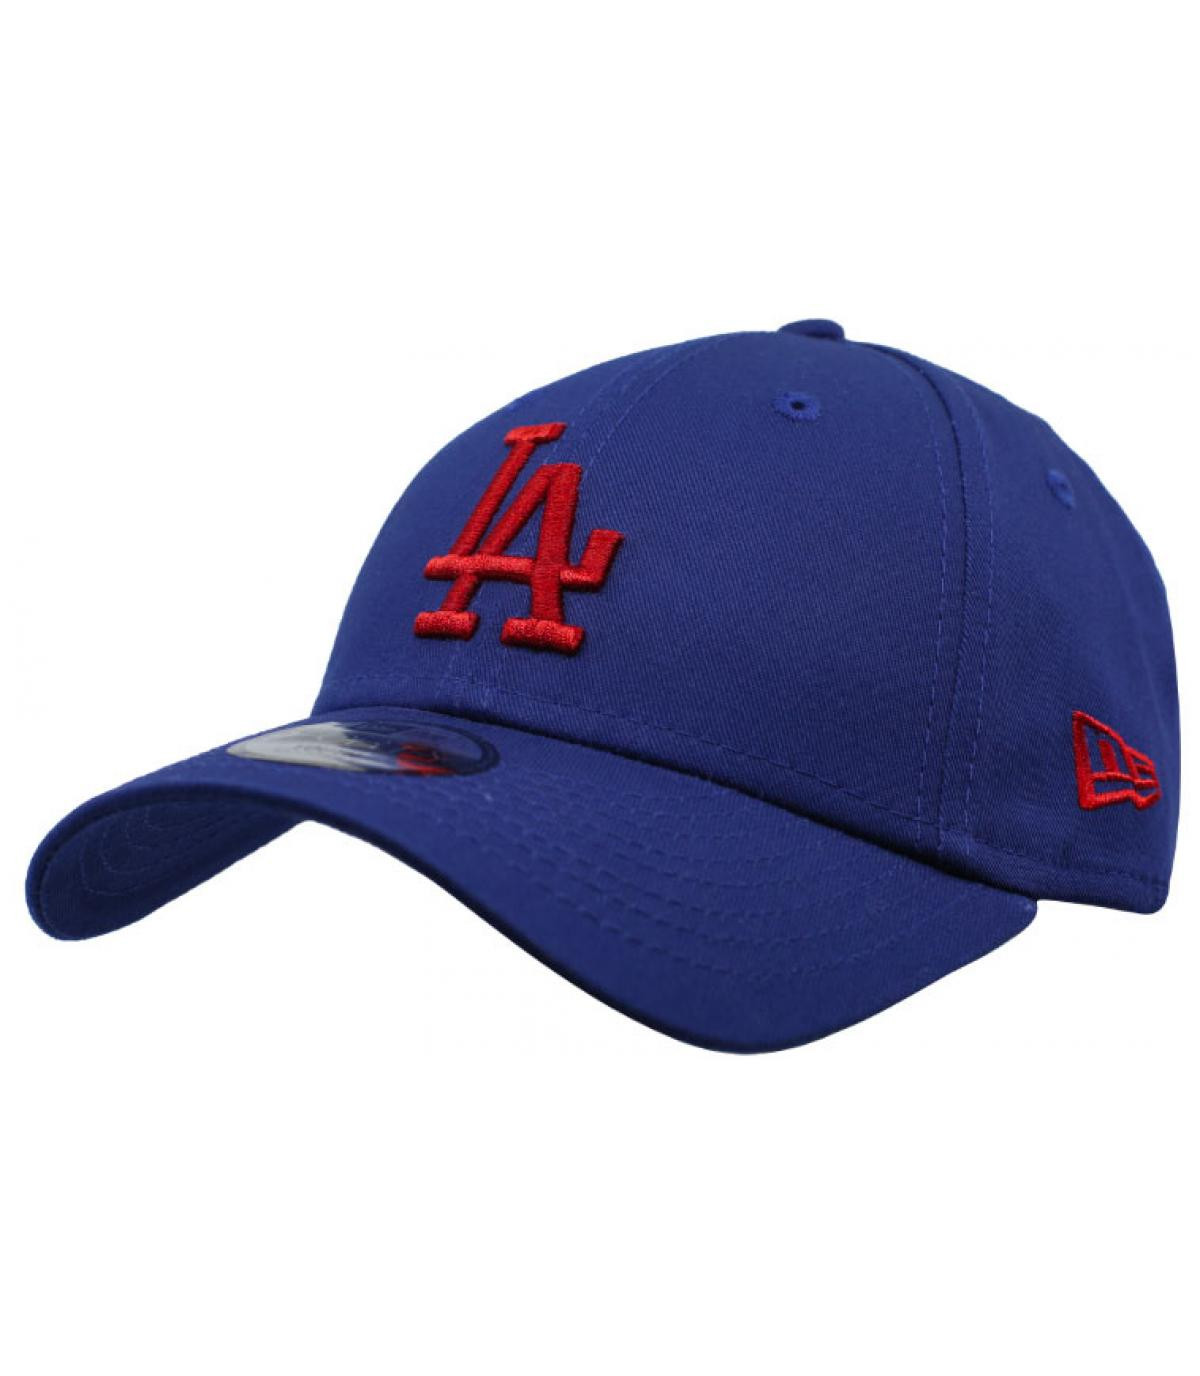 red blue LA child cap